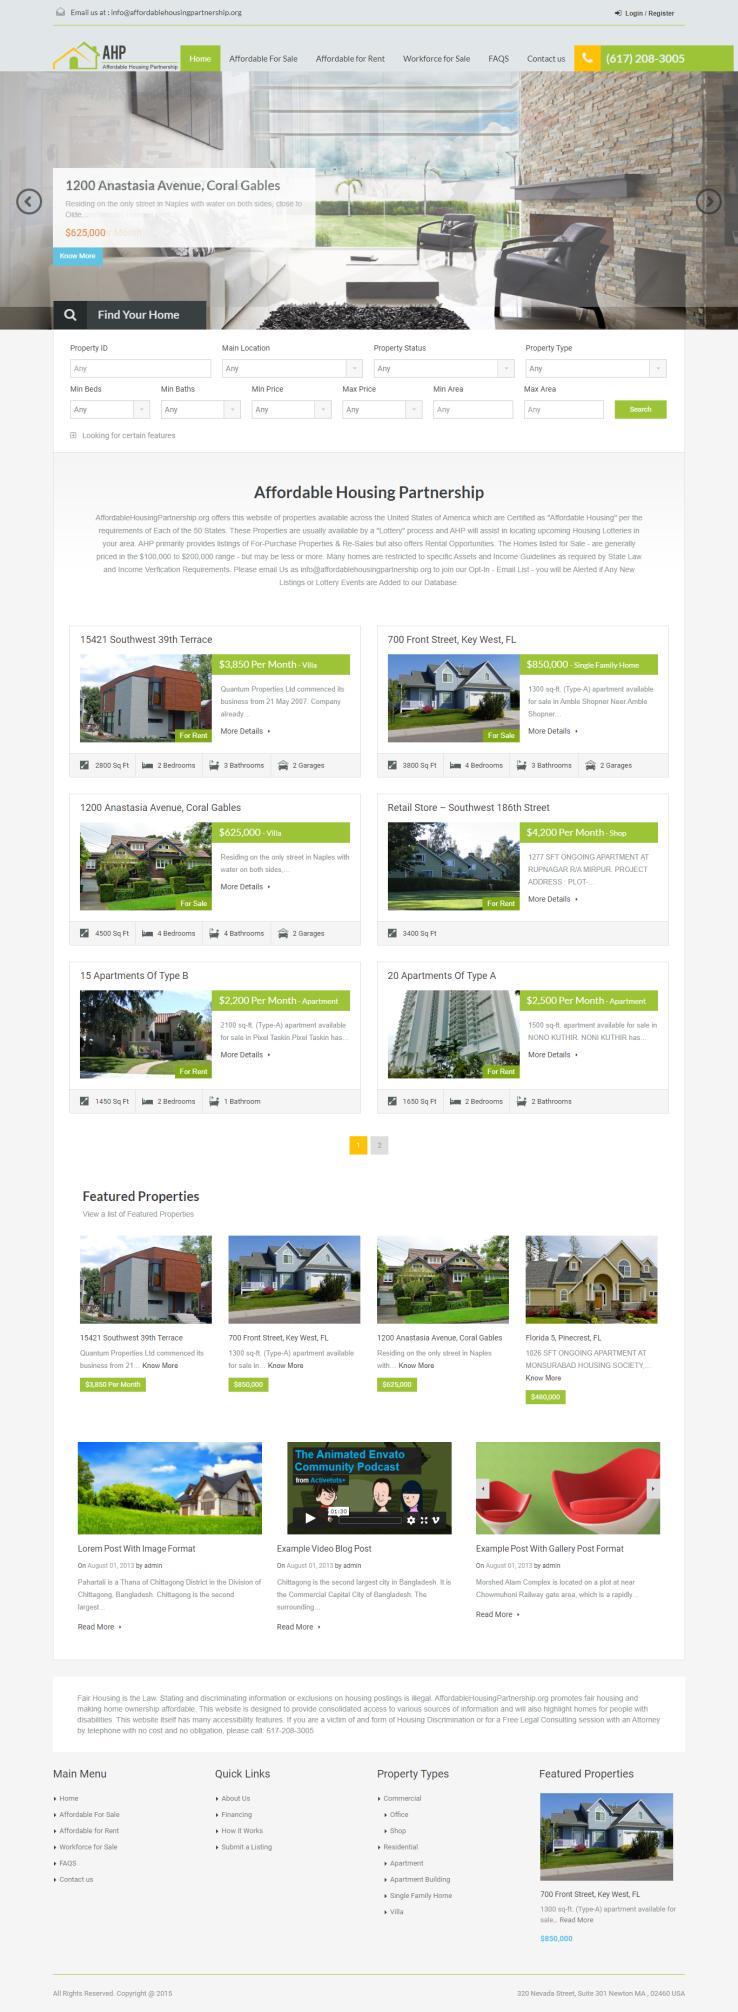 affordablehousingpartnership